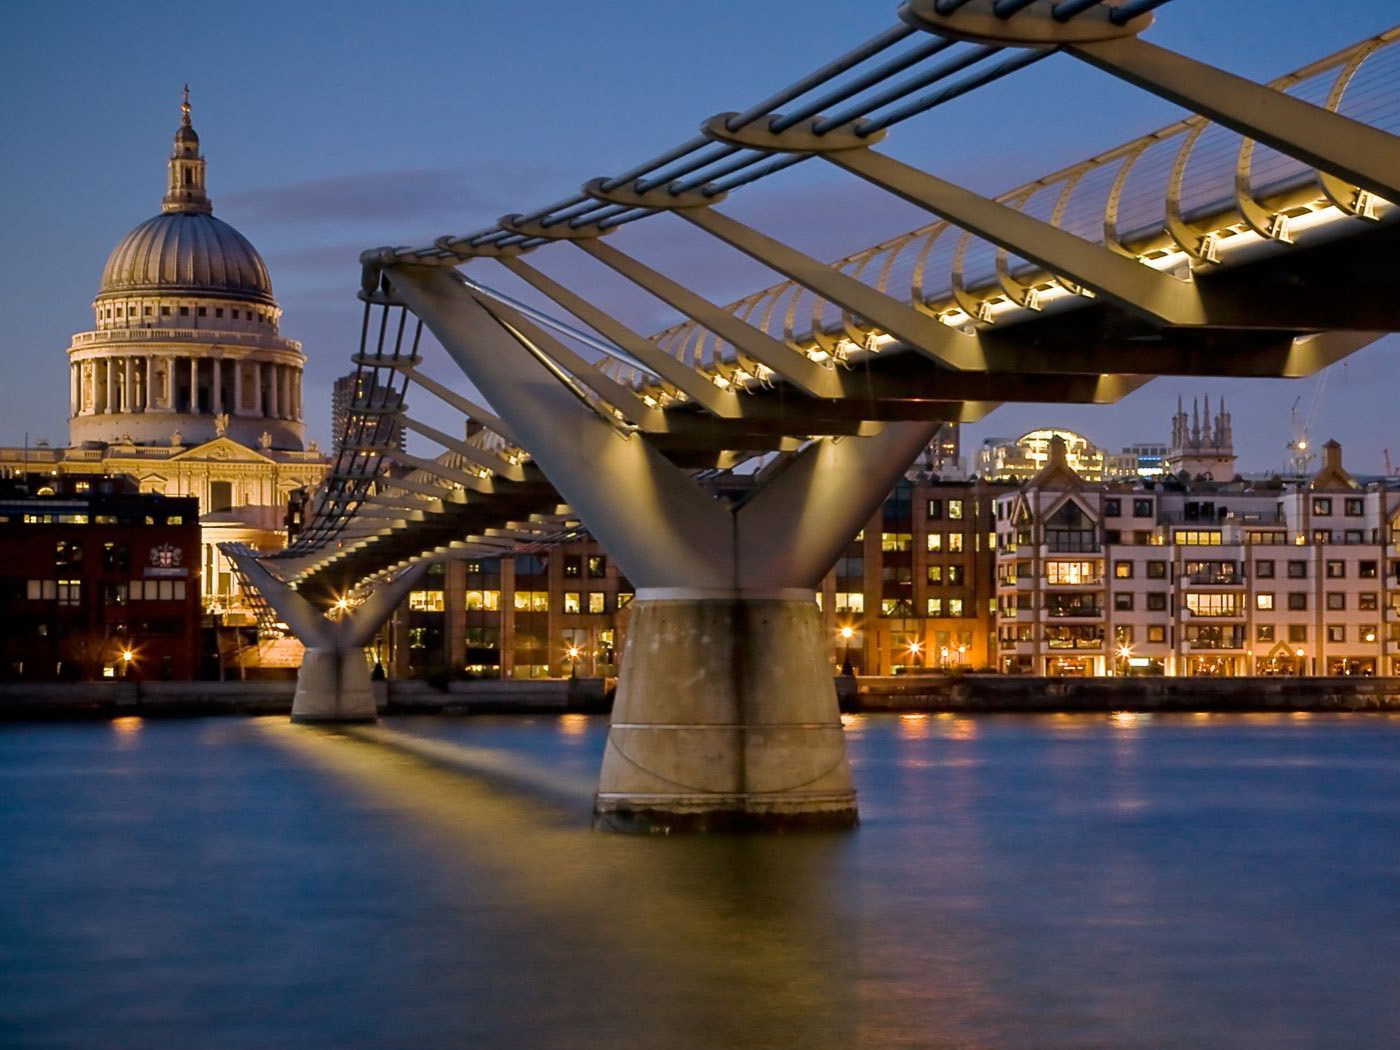 London Tower Bridge at Night Wall Mural & Photo  - tower bridge at night wallpapers